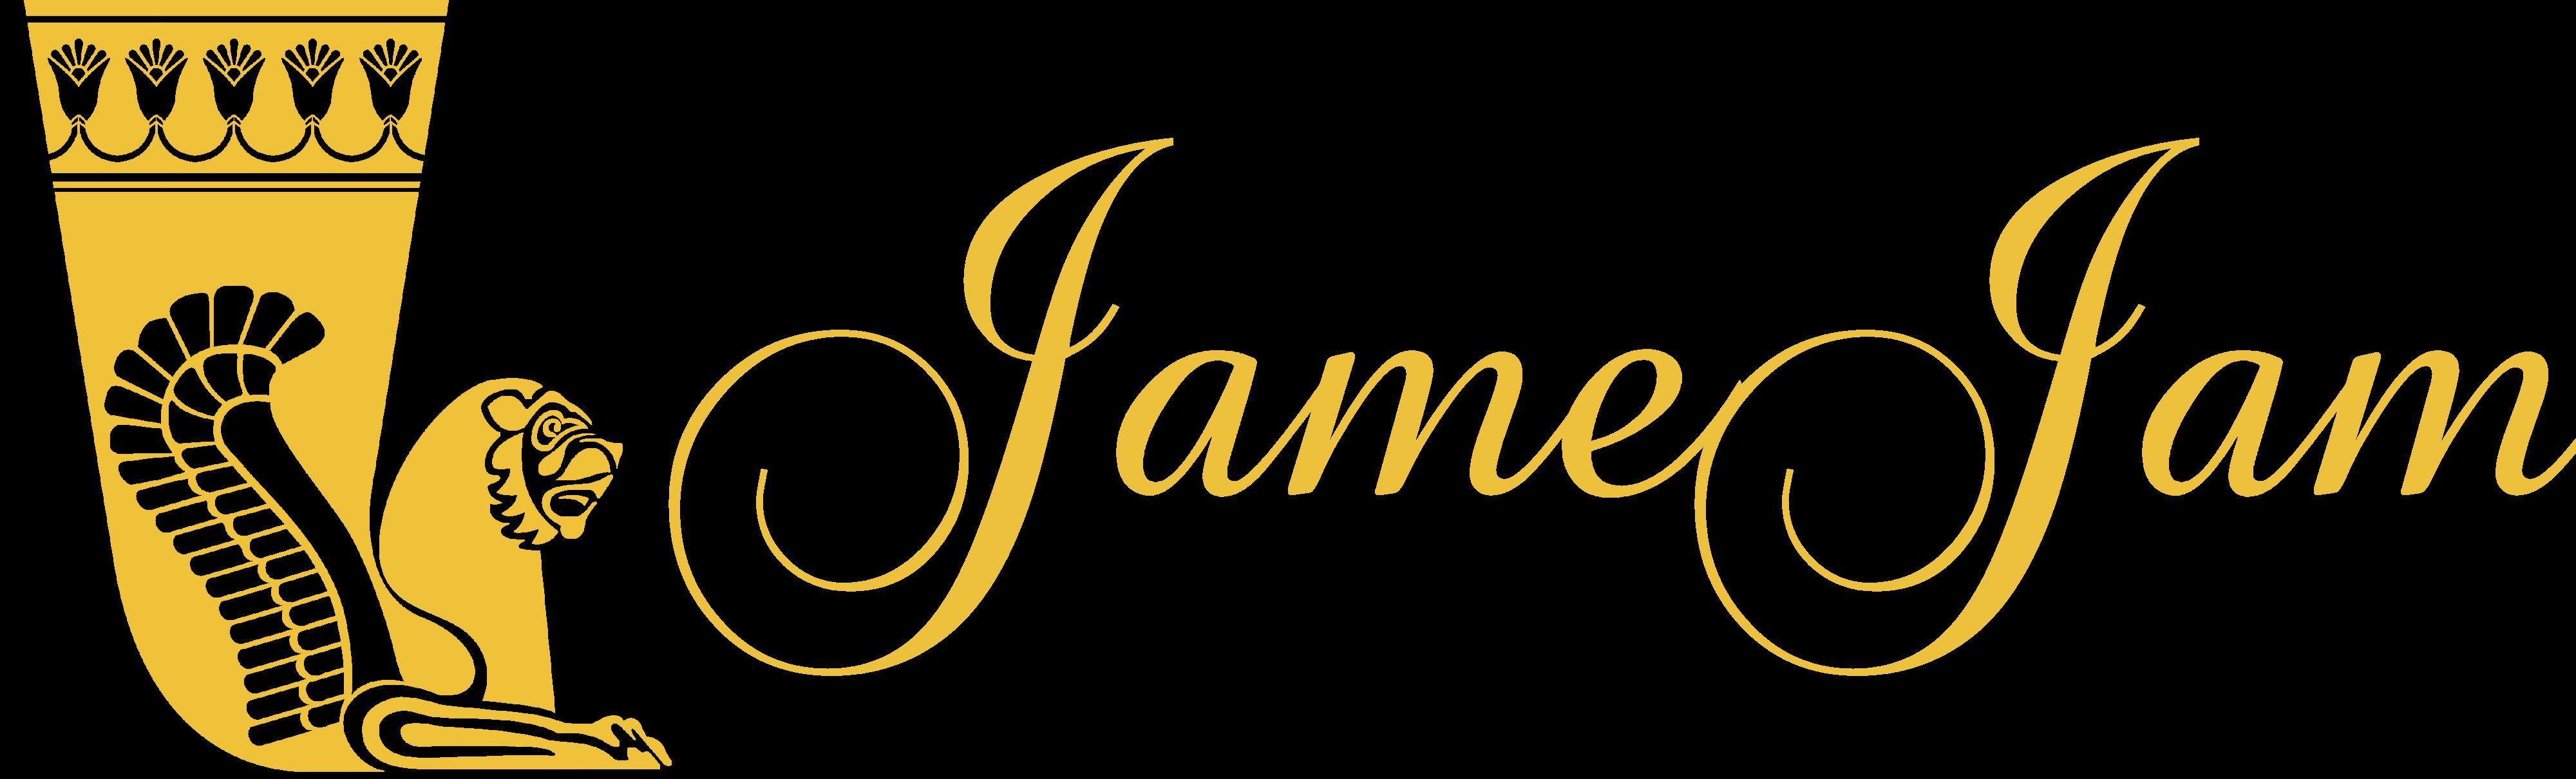 JameJam Persian Cuisine in Tokyoイラン料理 ジャーメ ジャム(RestaurantJameJam)